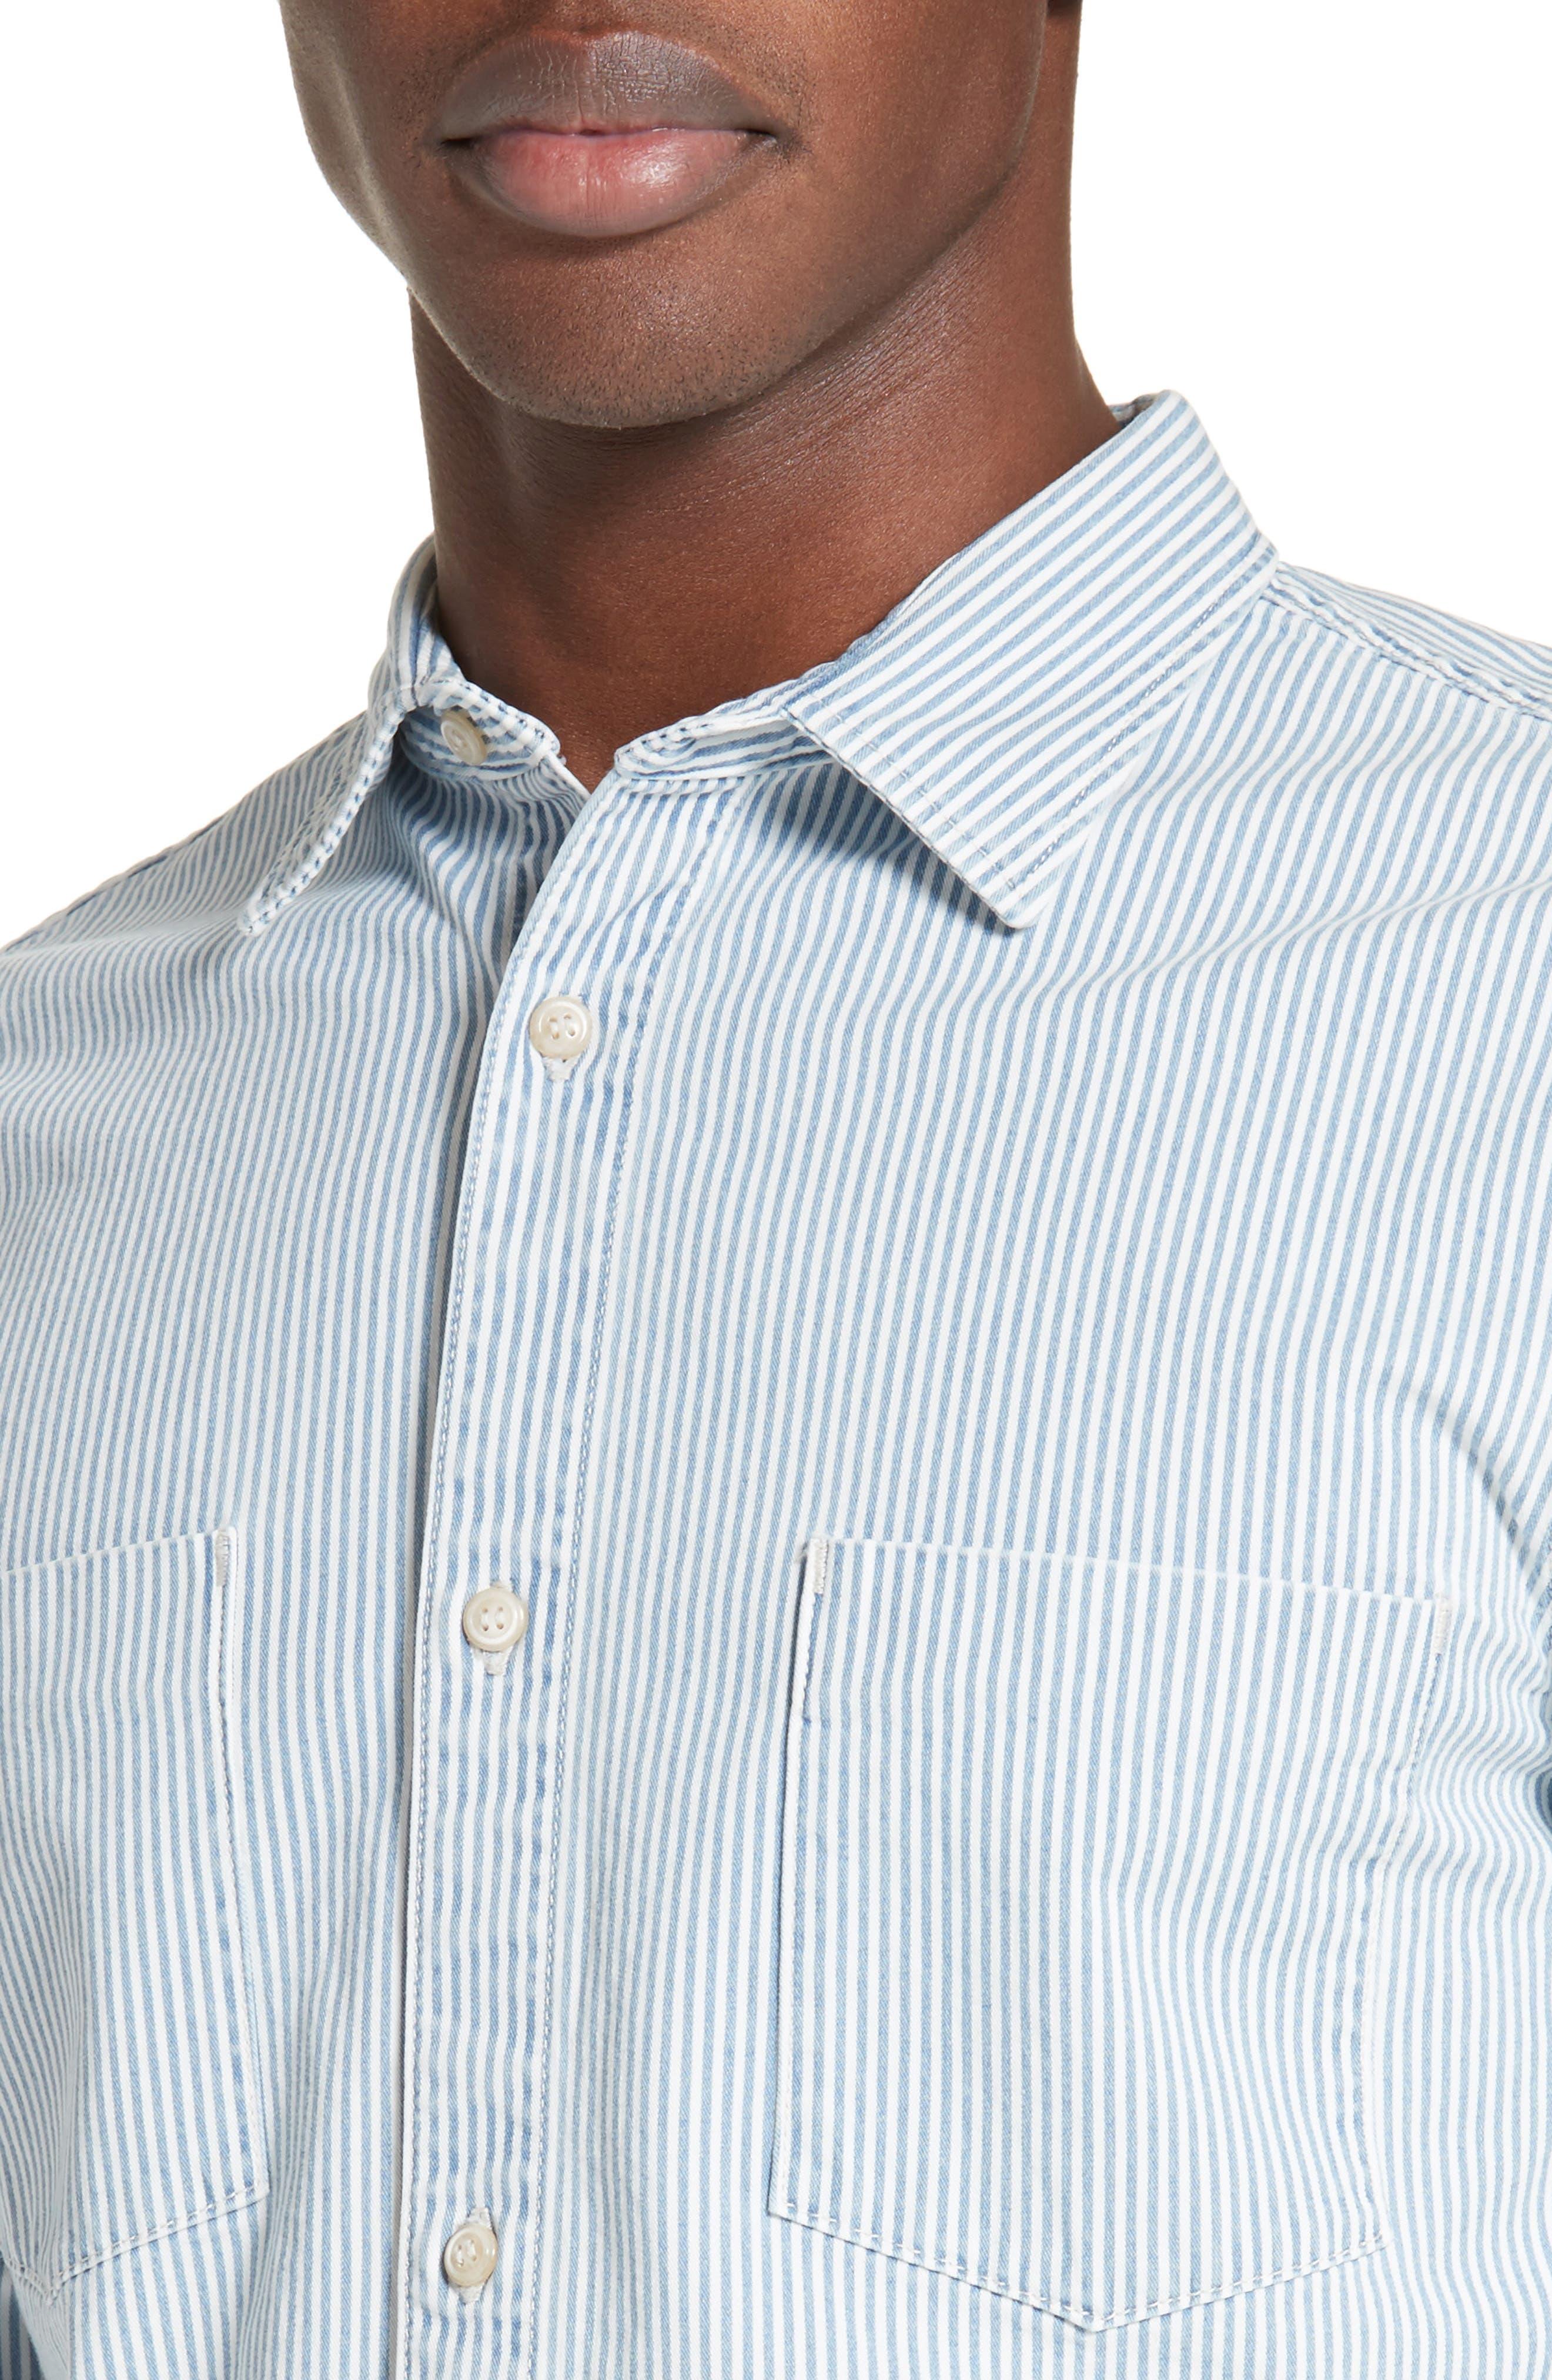 Riga Microstripe Denim Sport Shirt,                             Main thumbnail 1, color,                             461